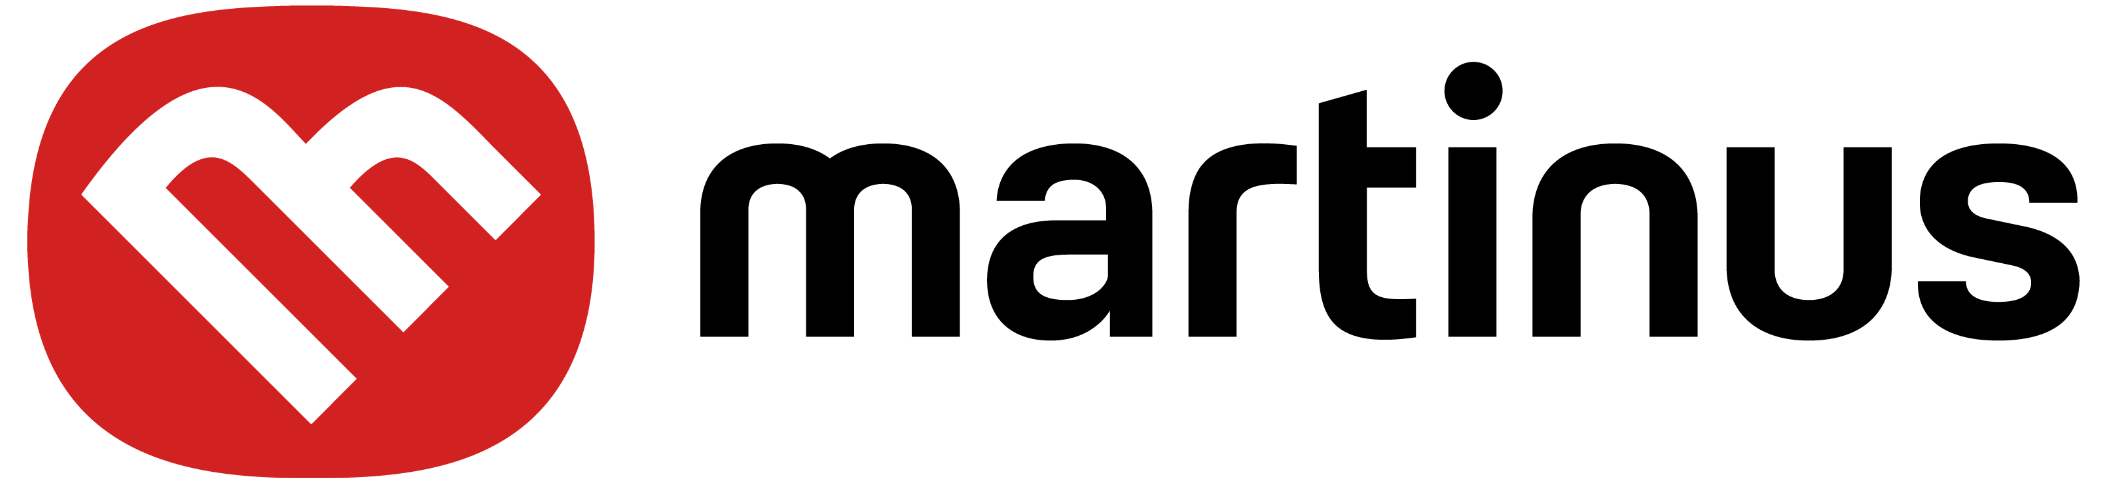 Výsledek obrázku pro logo martinus